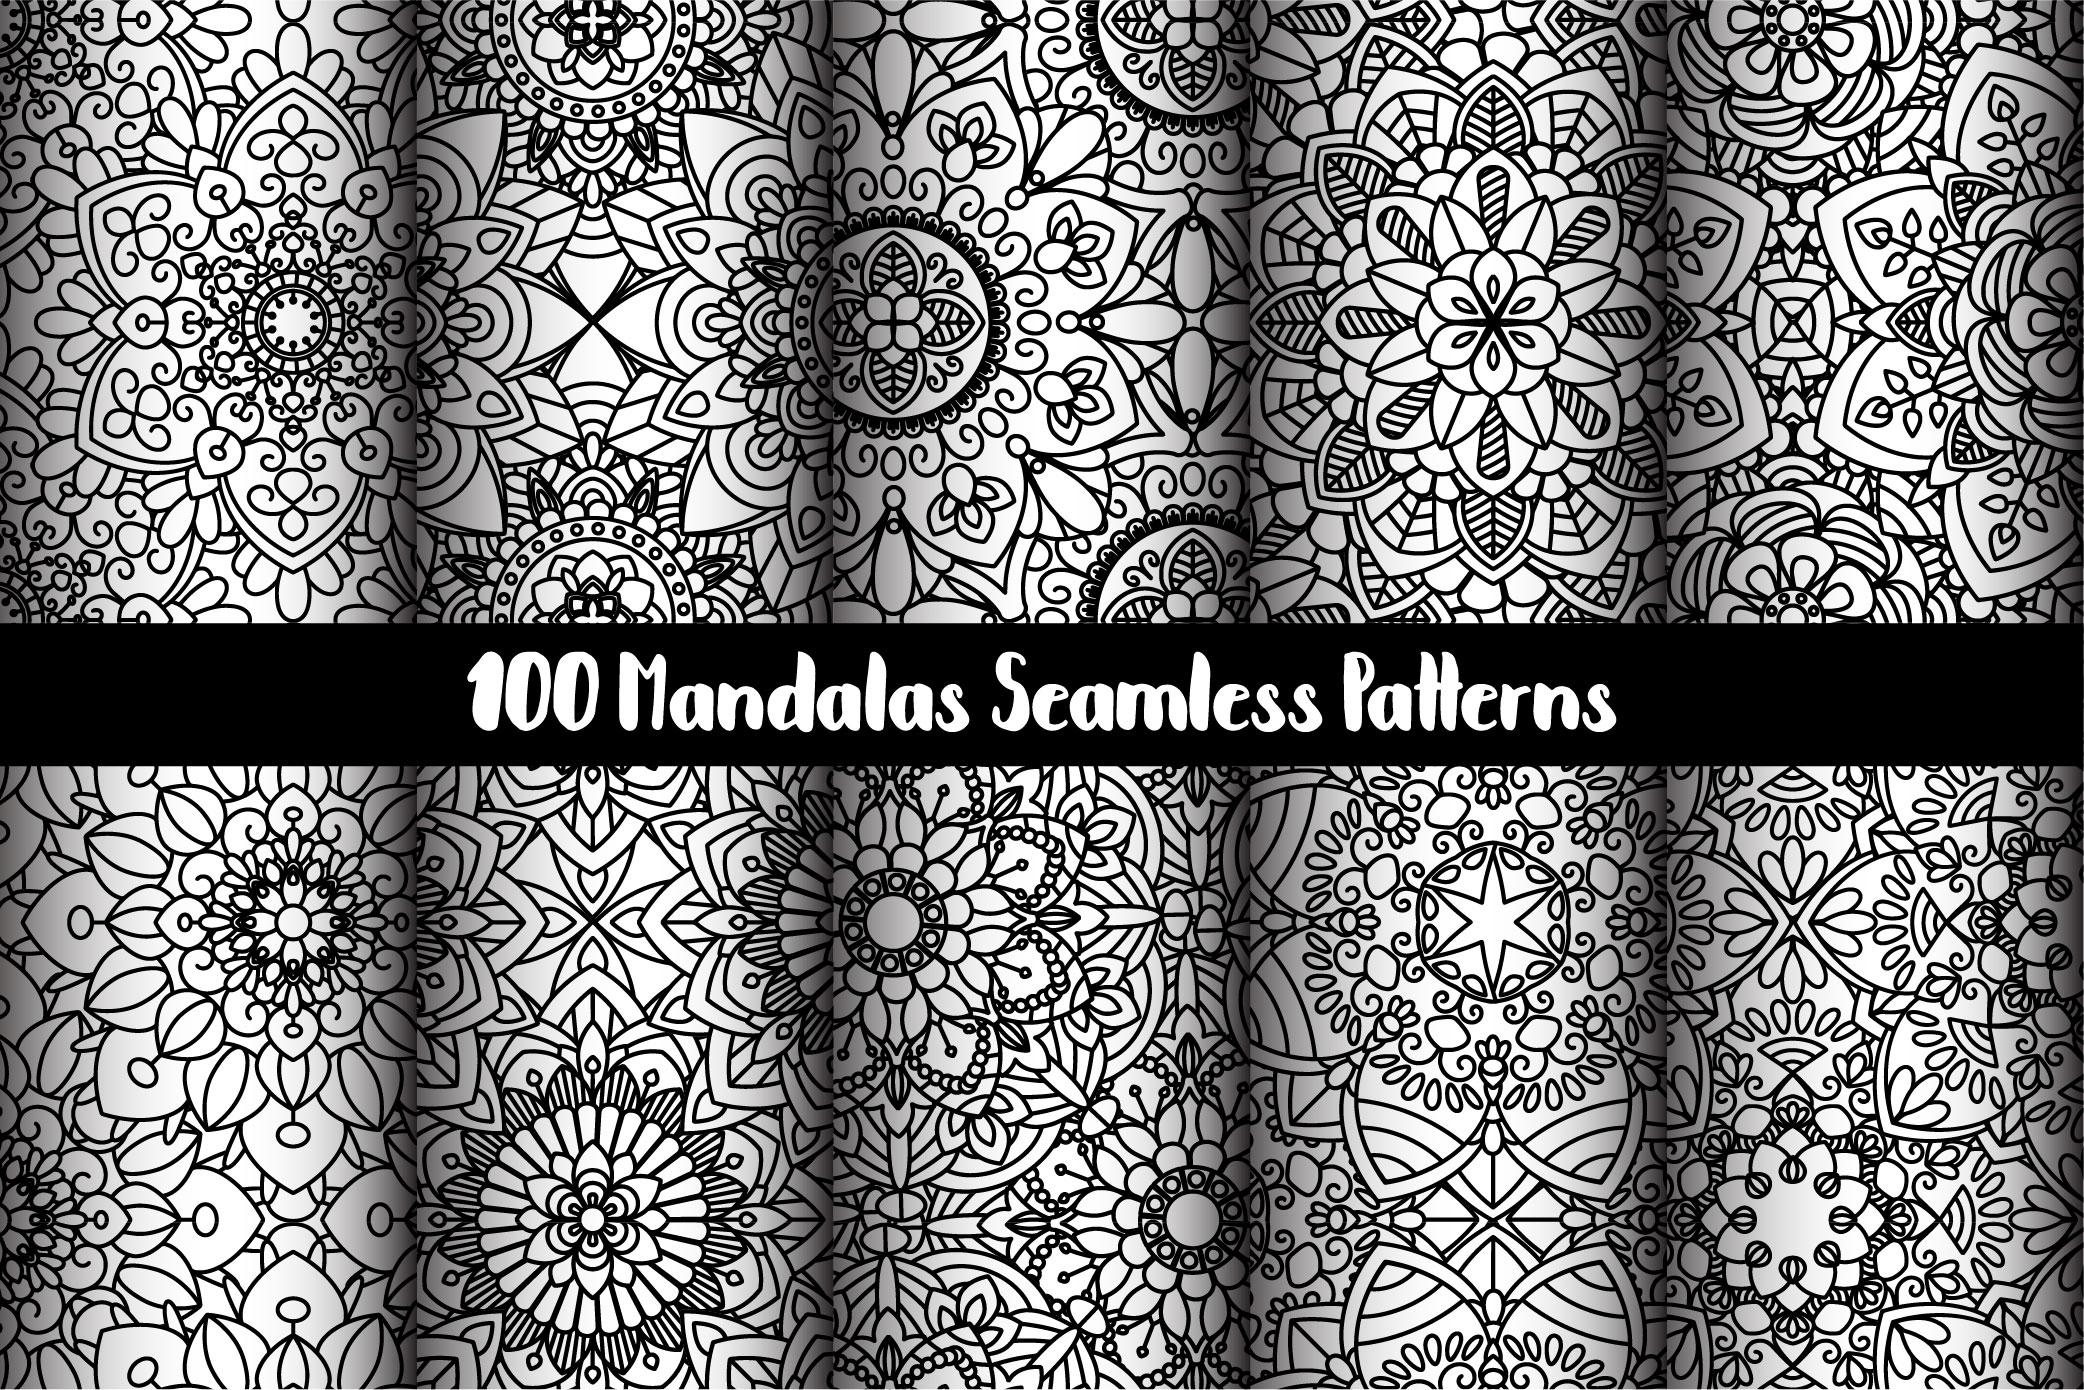 100 Mandalas Seamless Patterns example image 18